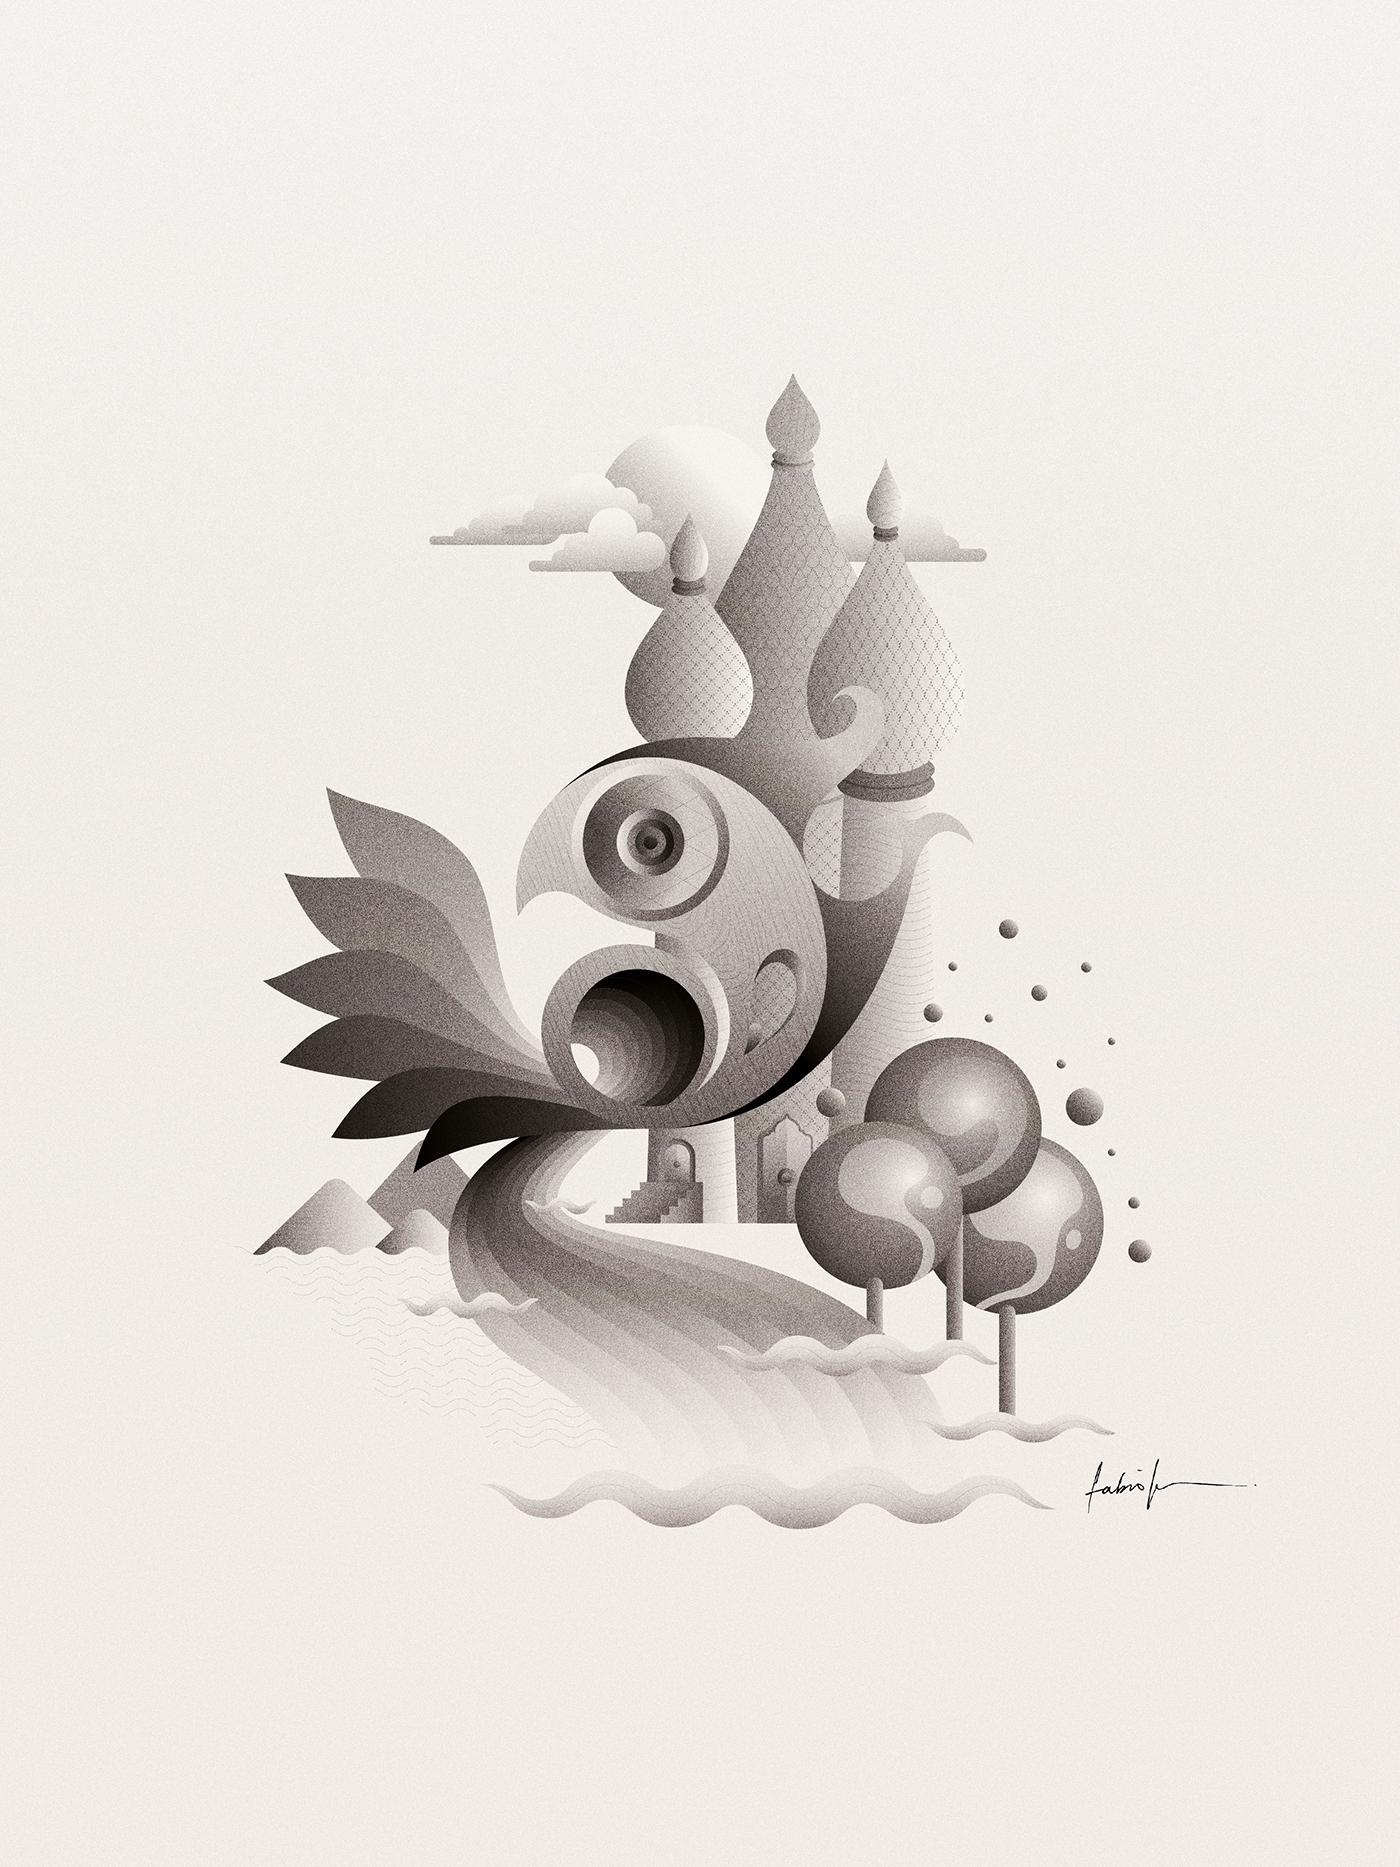 Kingdom, 2016. Digital illustra - fabioissao | ello